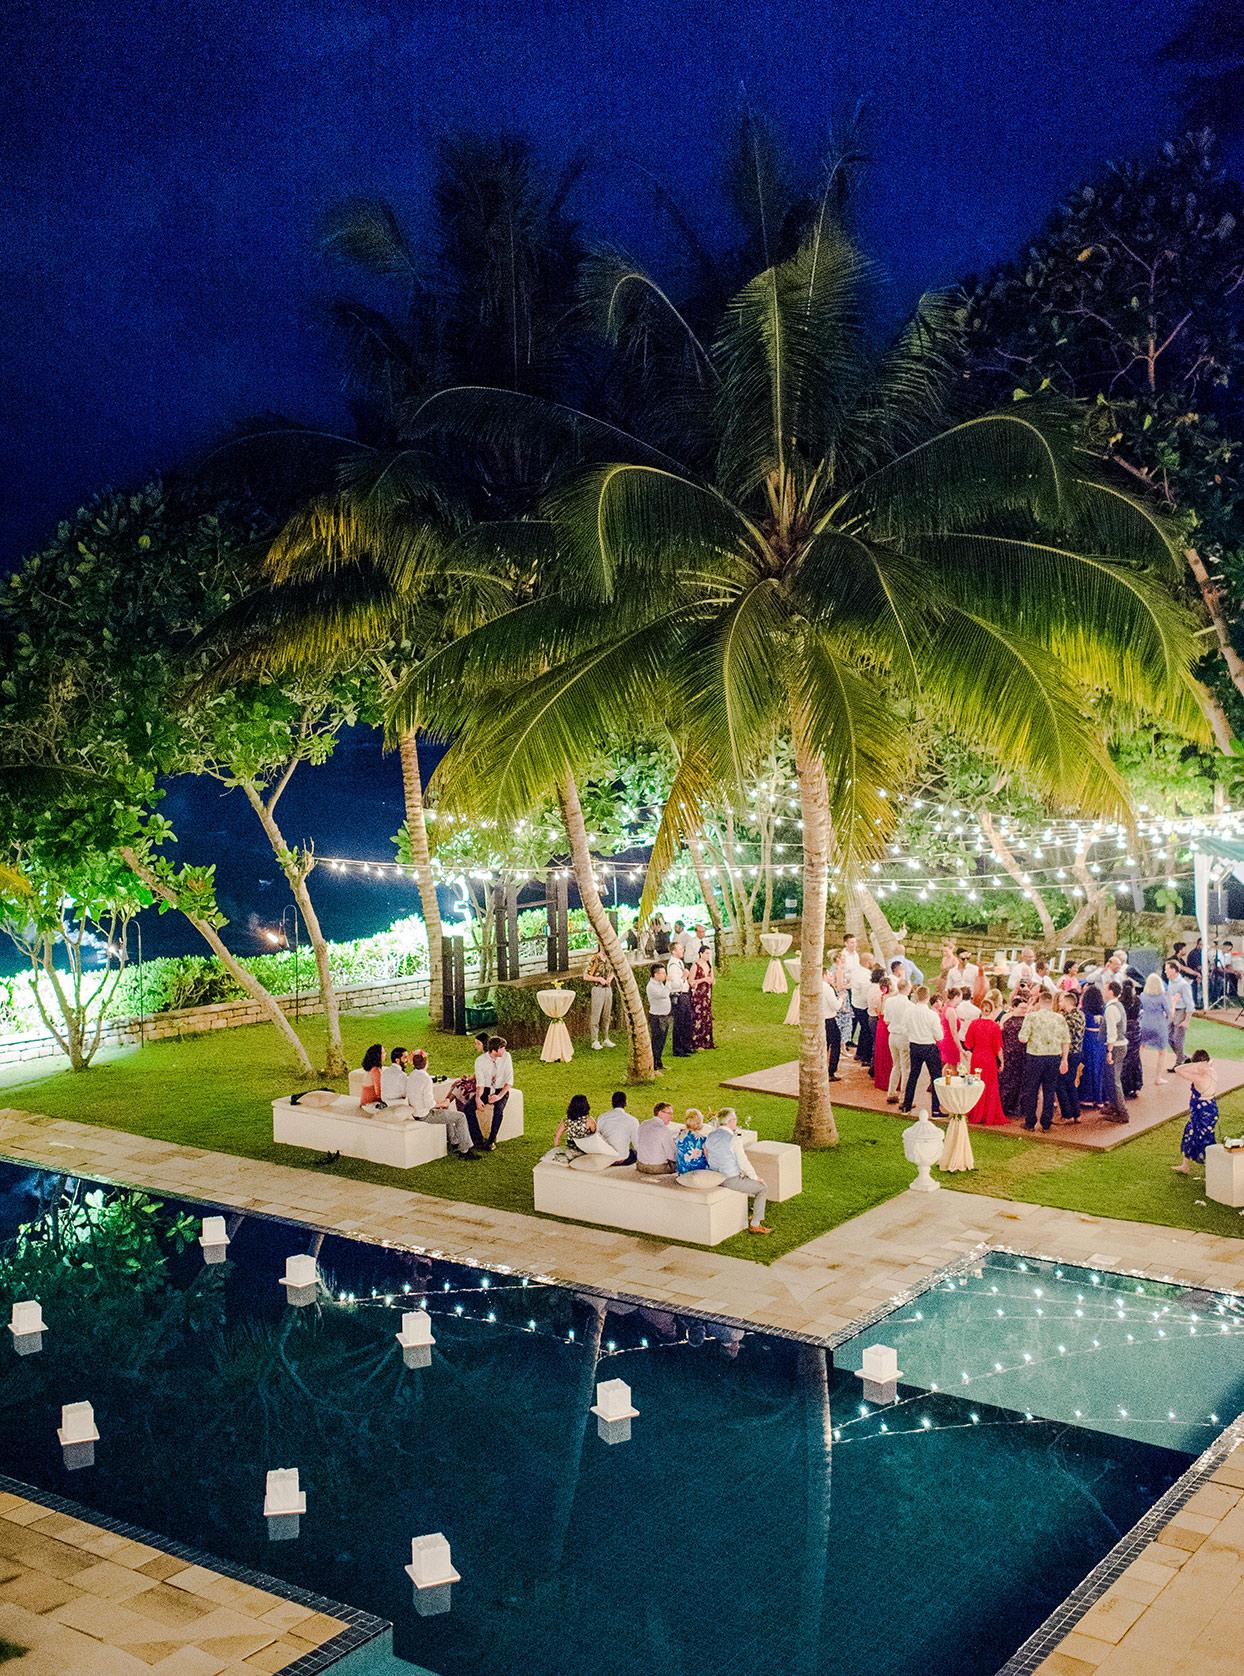 kelly sanjiv wedding reception party by pool